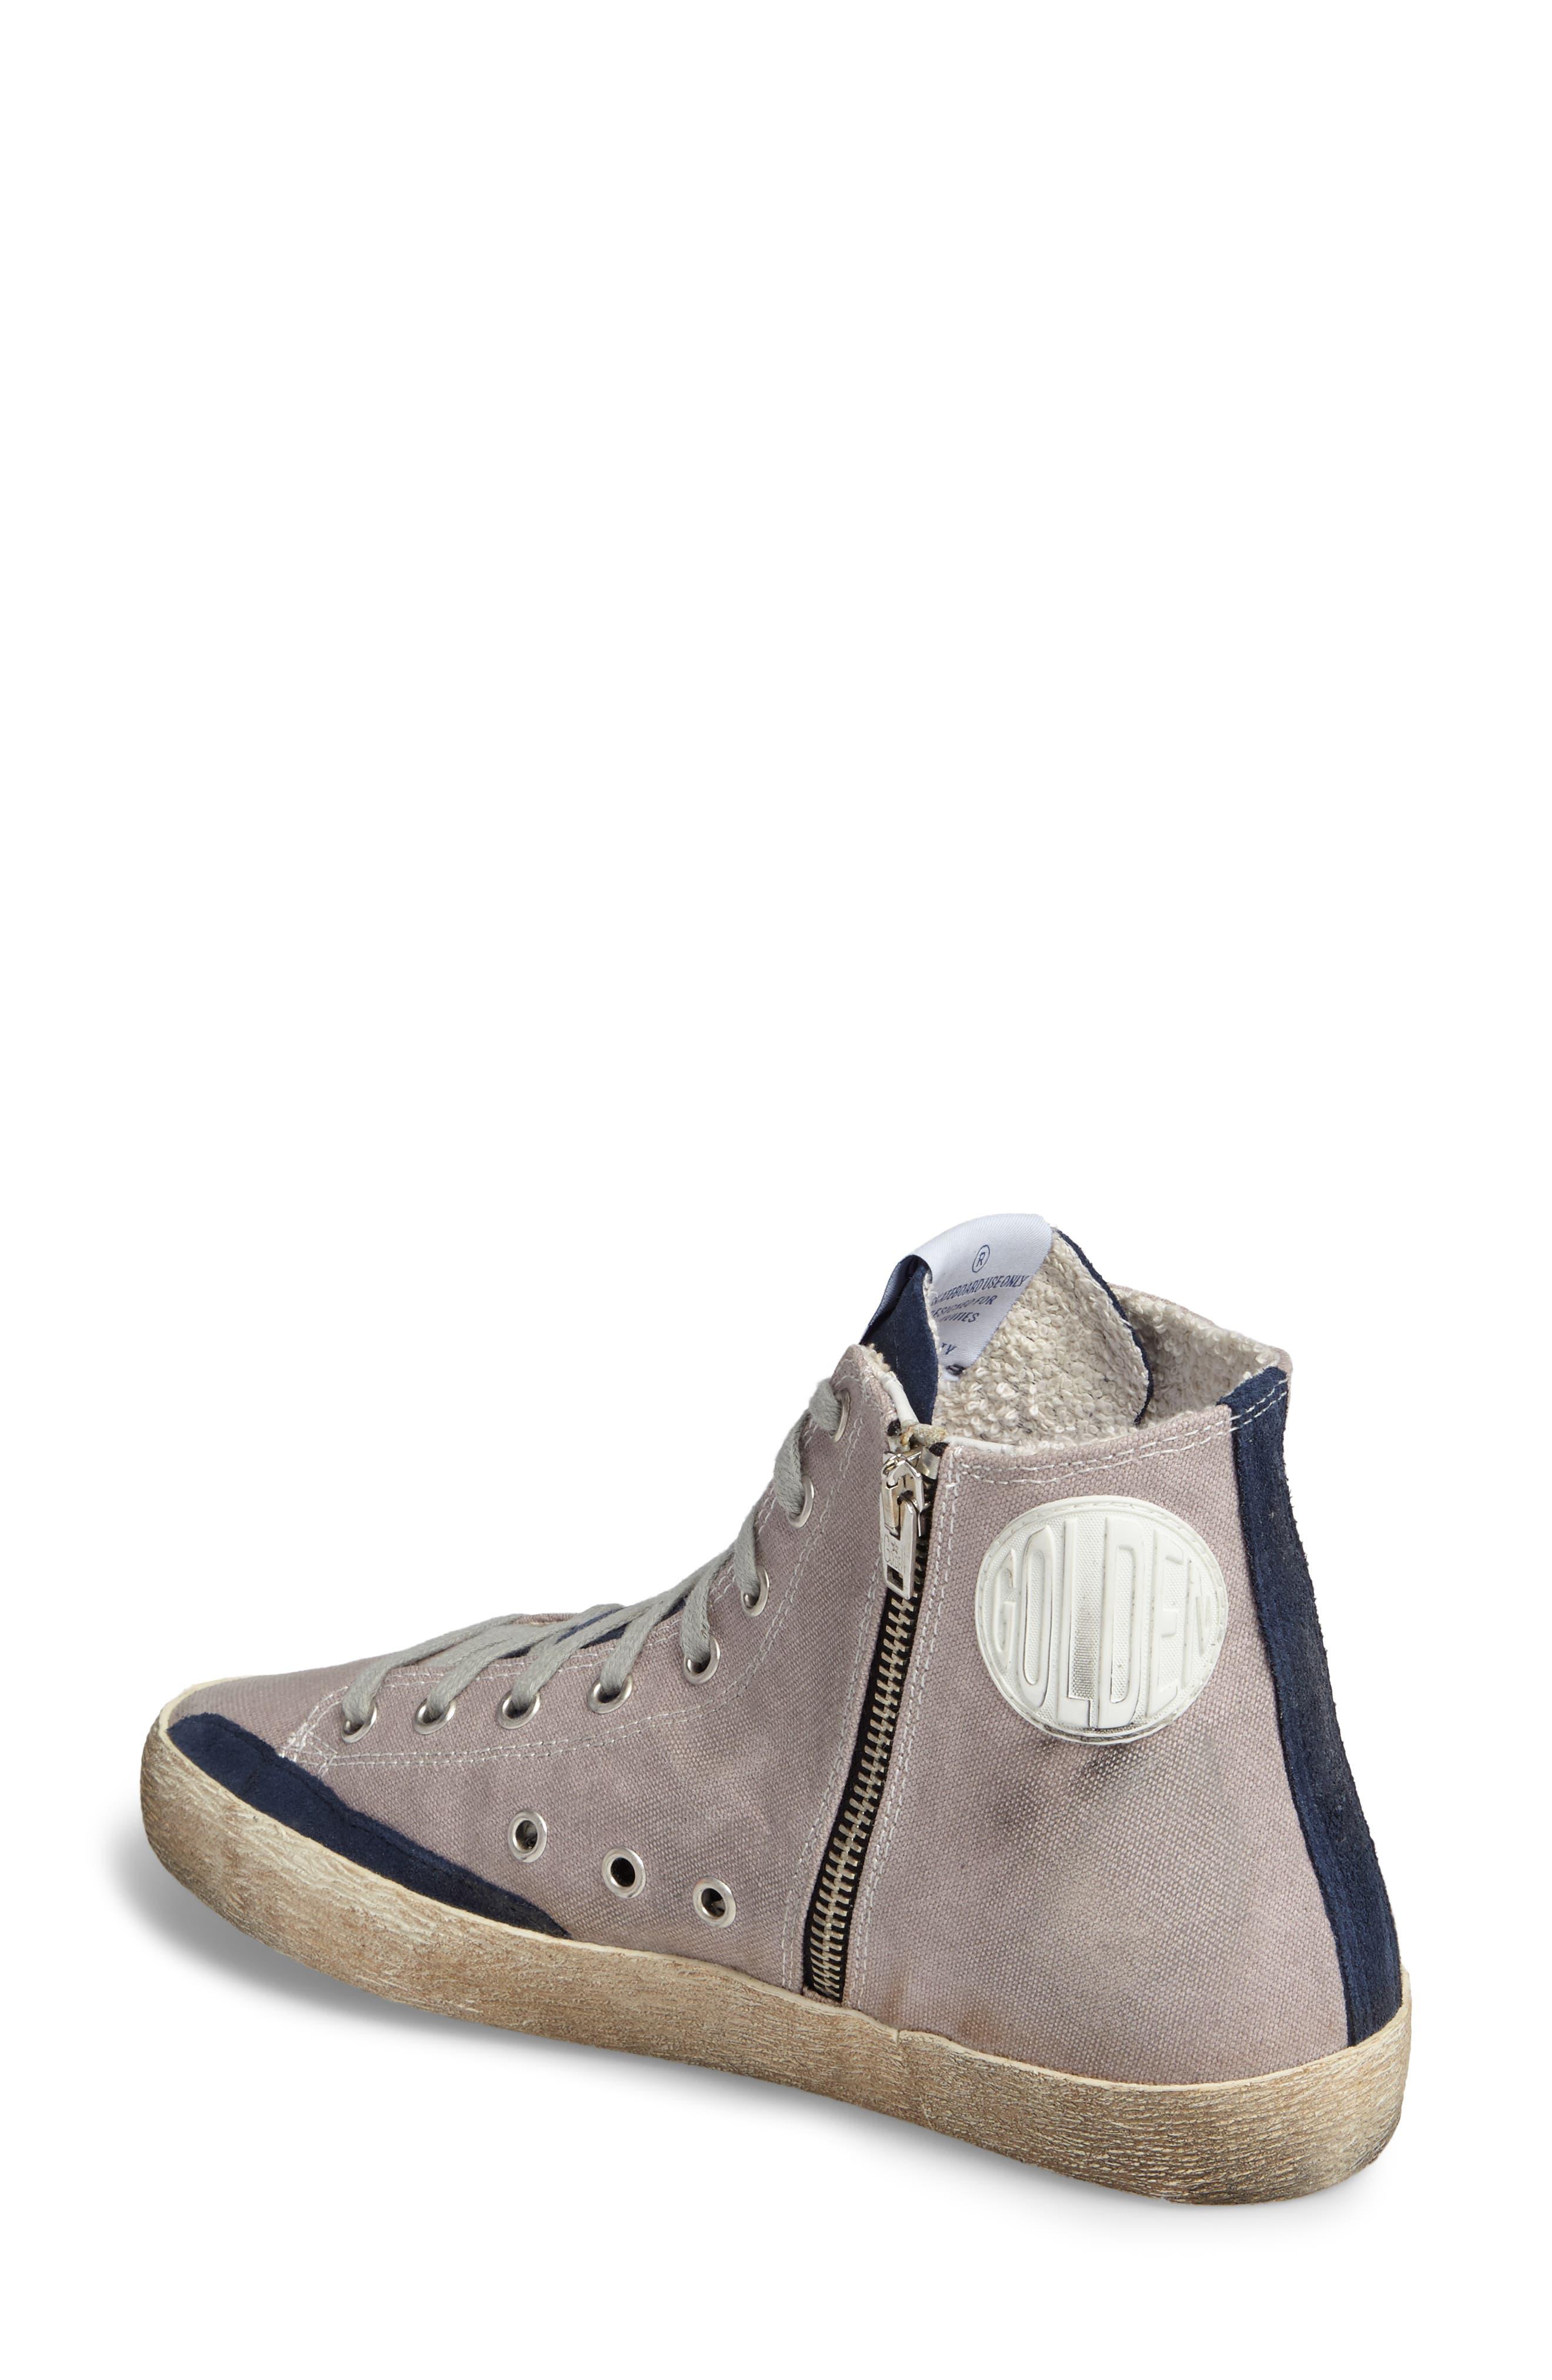 Francy Mid Top Sneaker,                             Alternate thumbnail 2, color,                             530